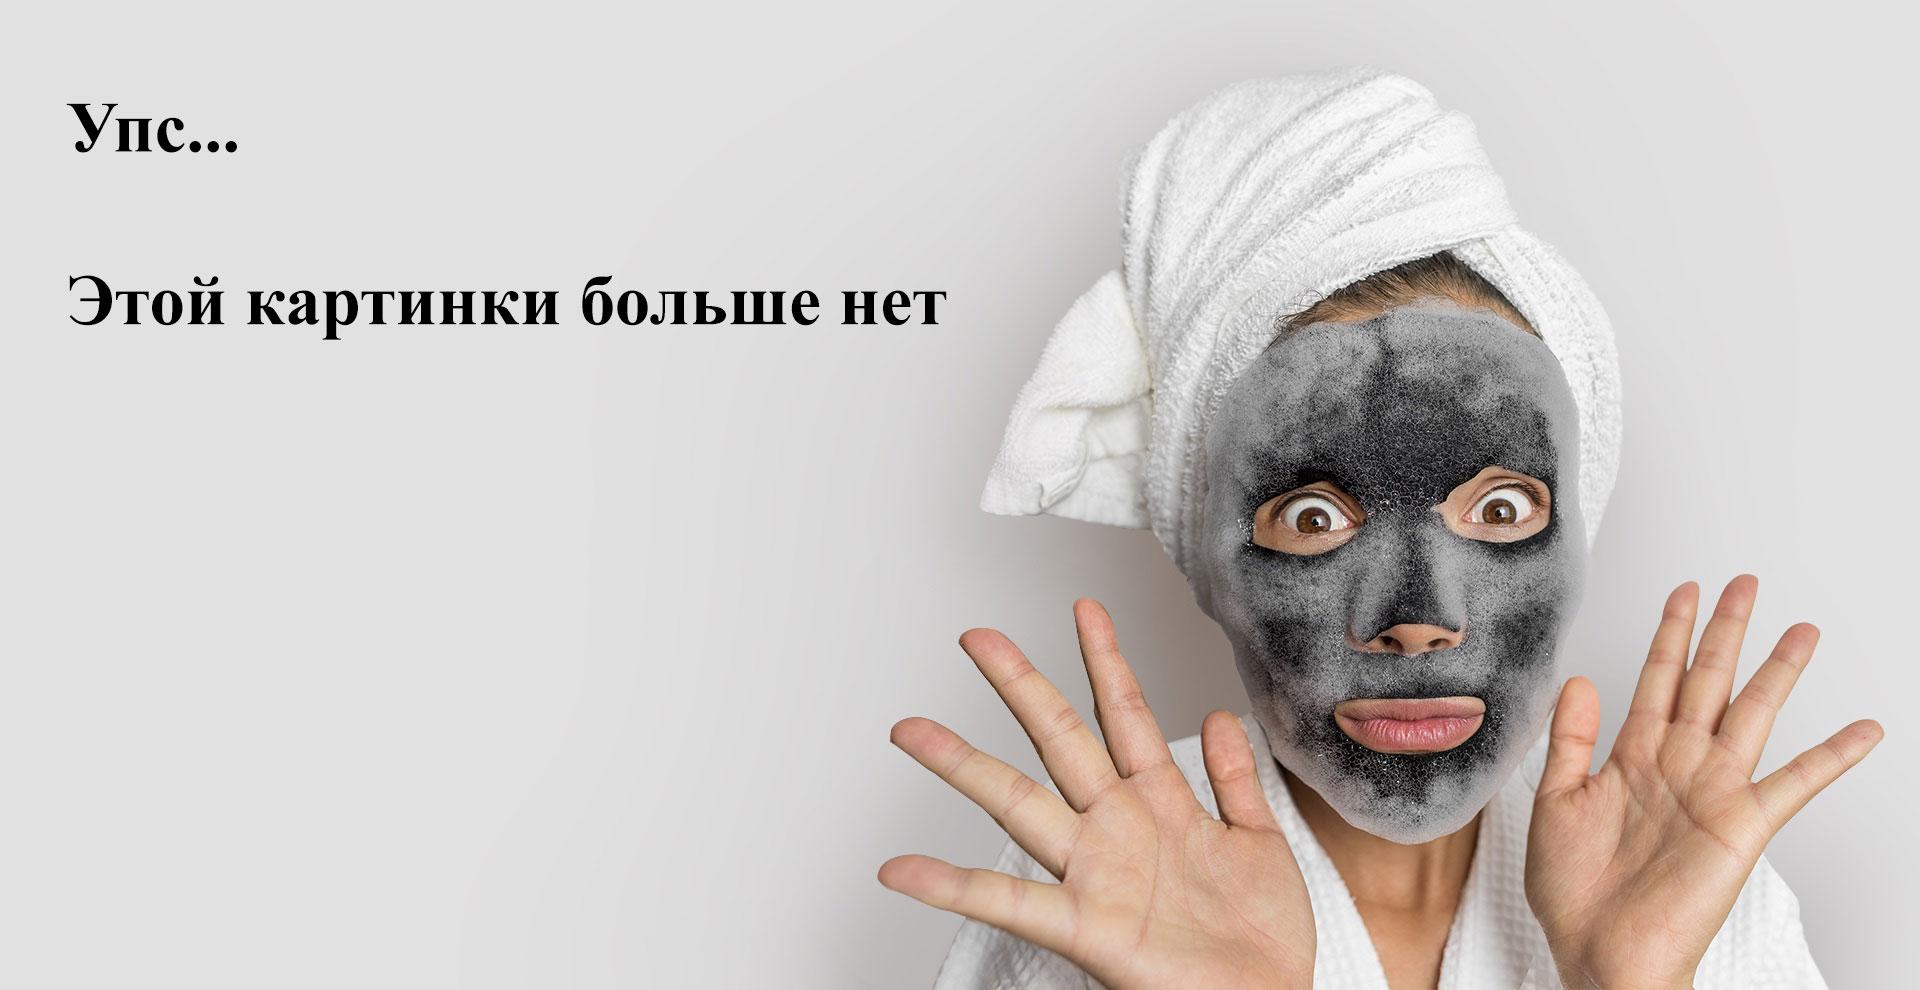 Levrana, Зубная паста «Укрепление десен», 75 мл